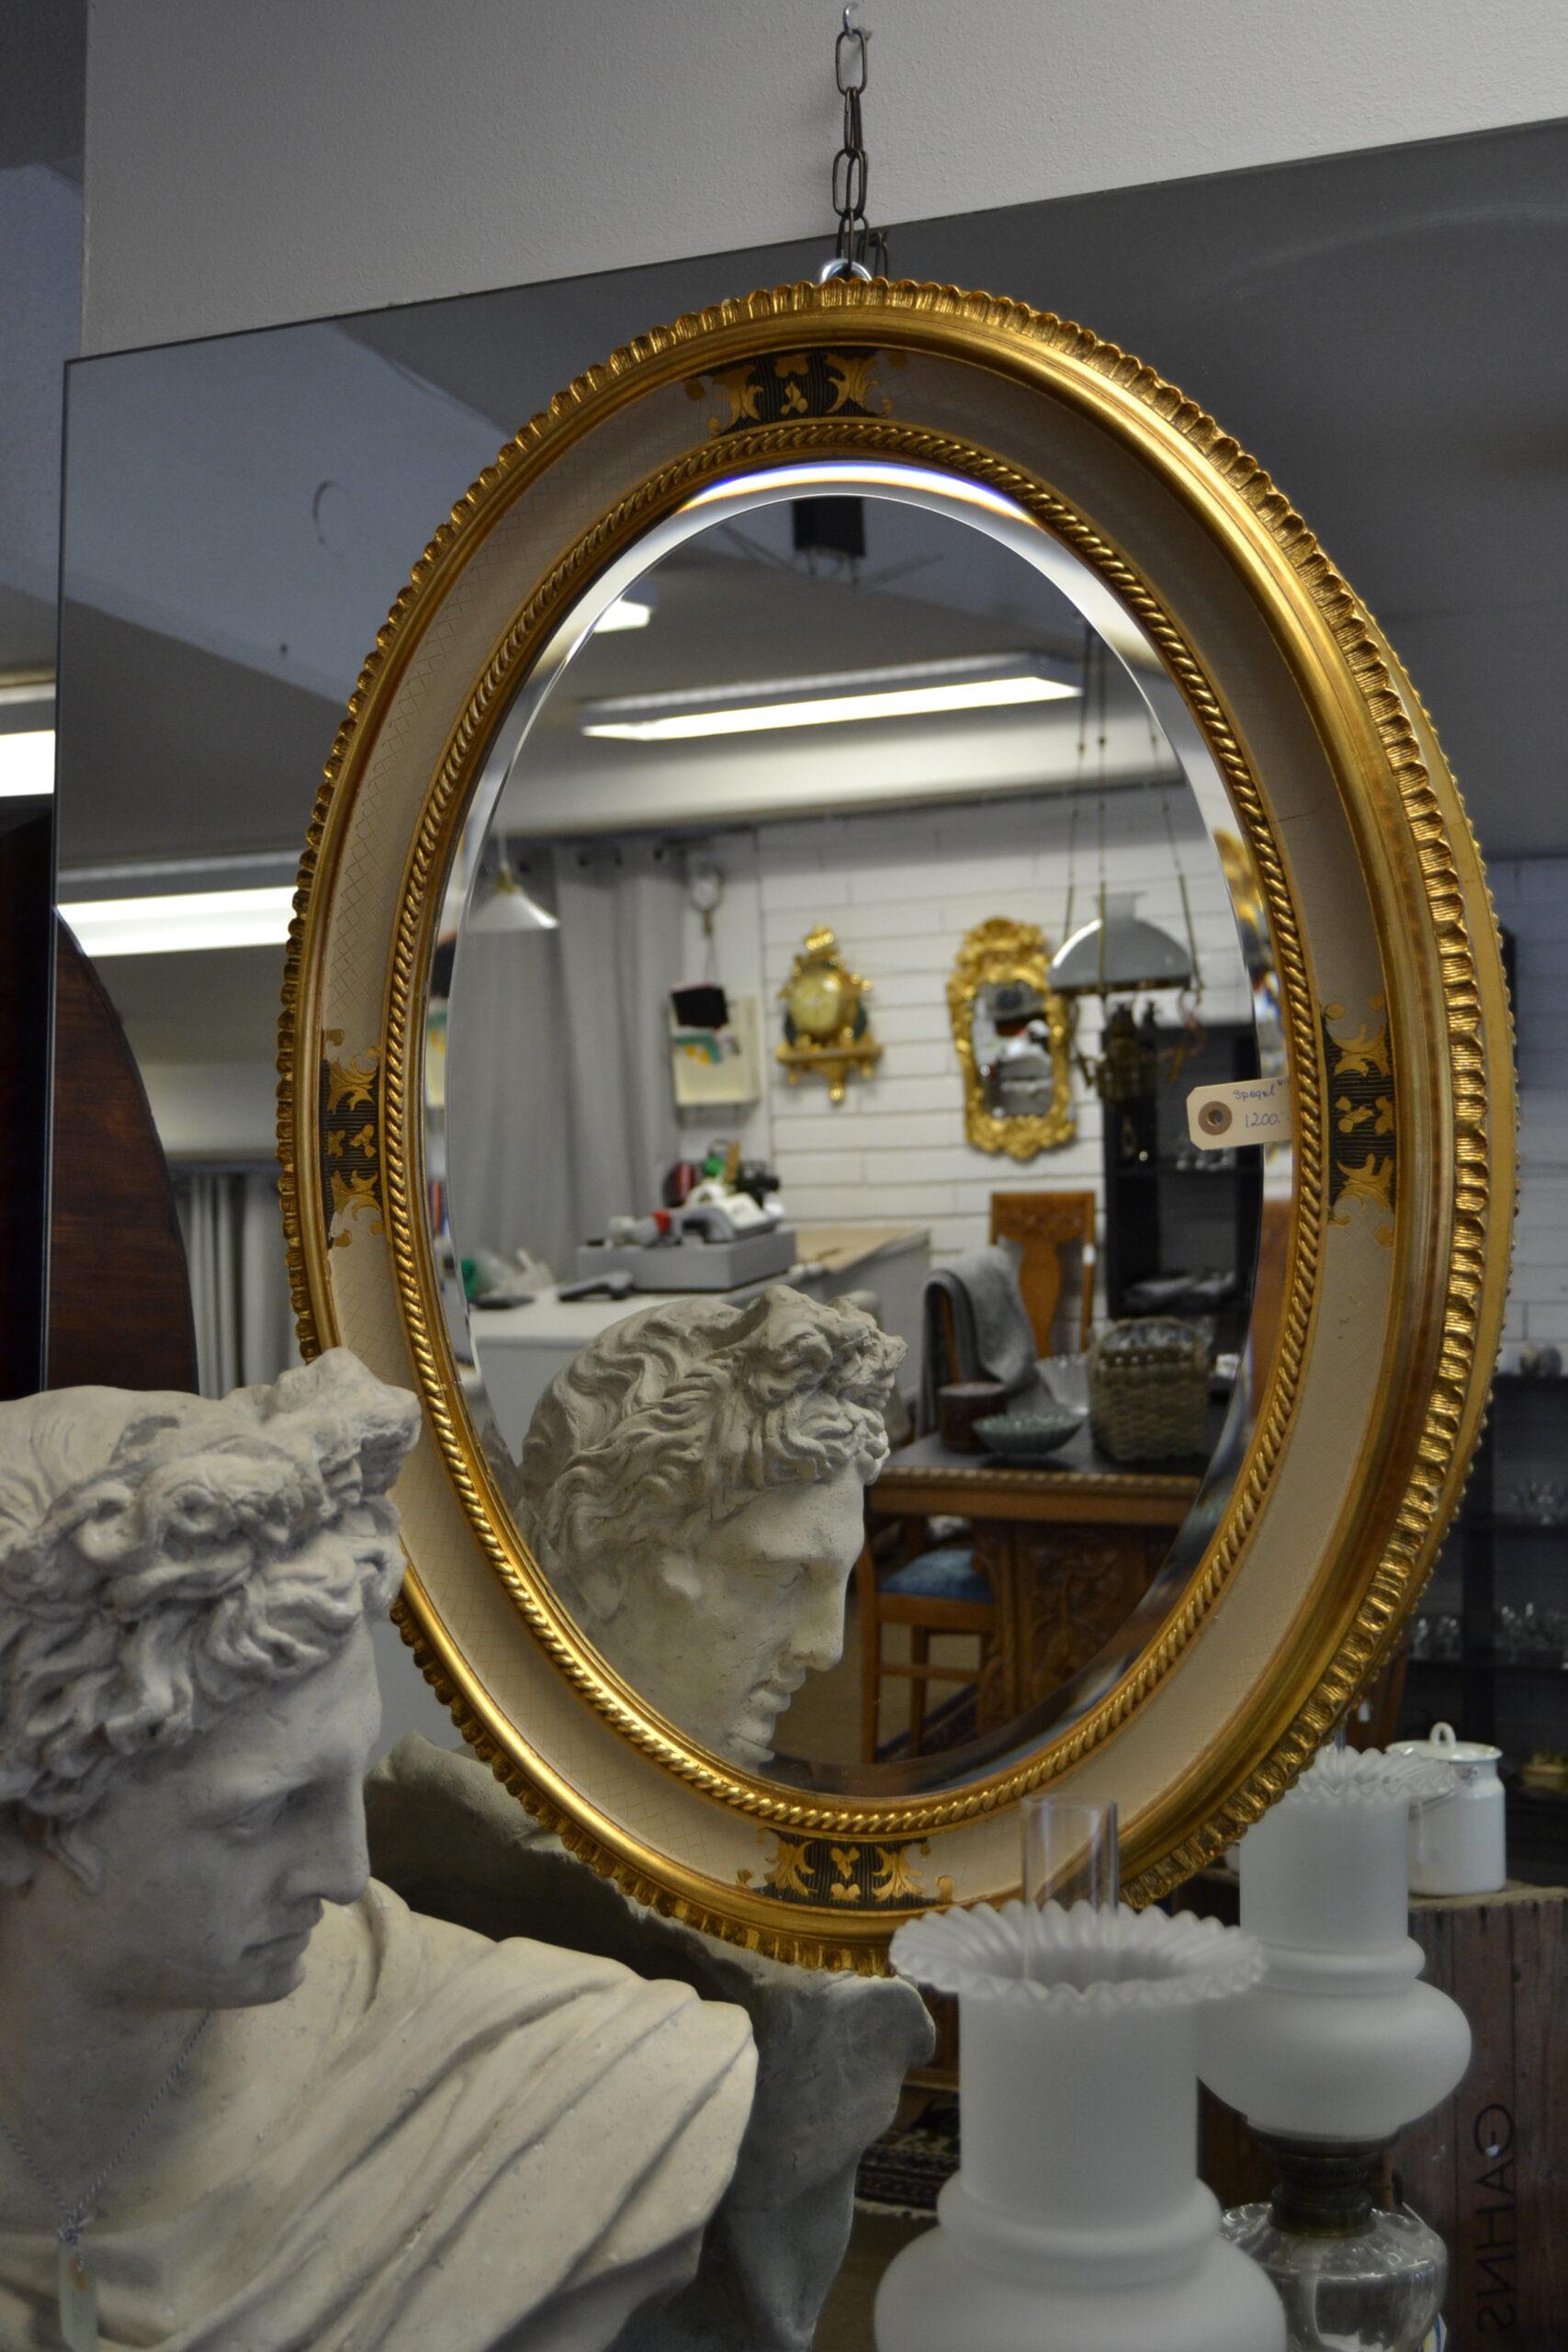 Spegel oval fazettslipat glas